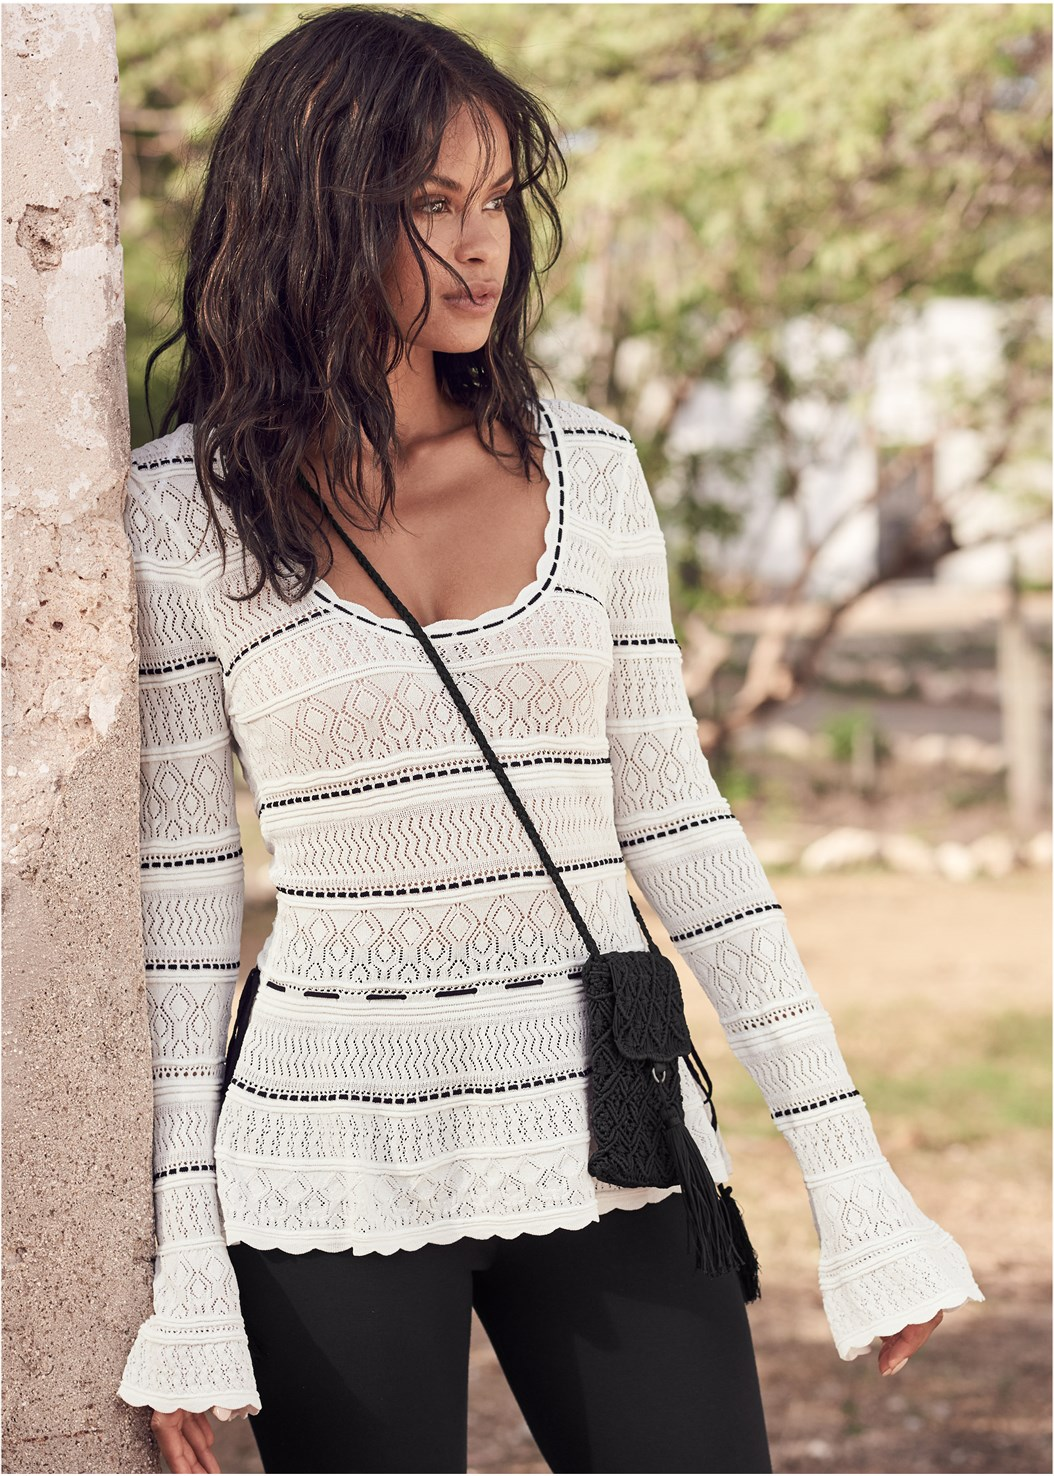 Bell Sleeve Sweater,Slimming Stretch Jeggings,Ruffle Hem Pants,High Heel Strappy Sandals,Tassel Detail Bag